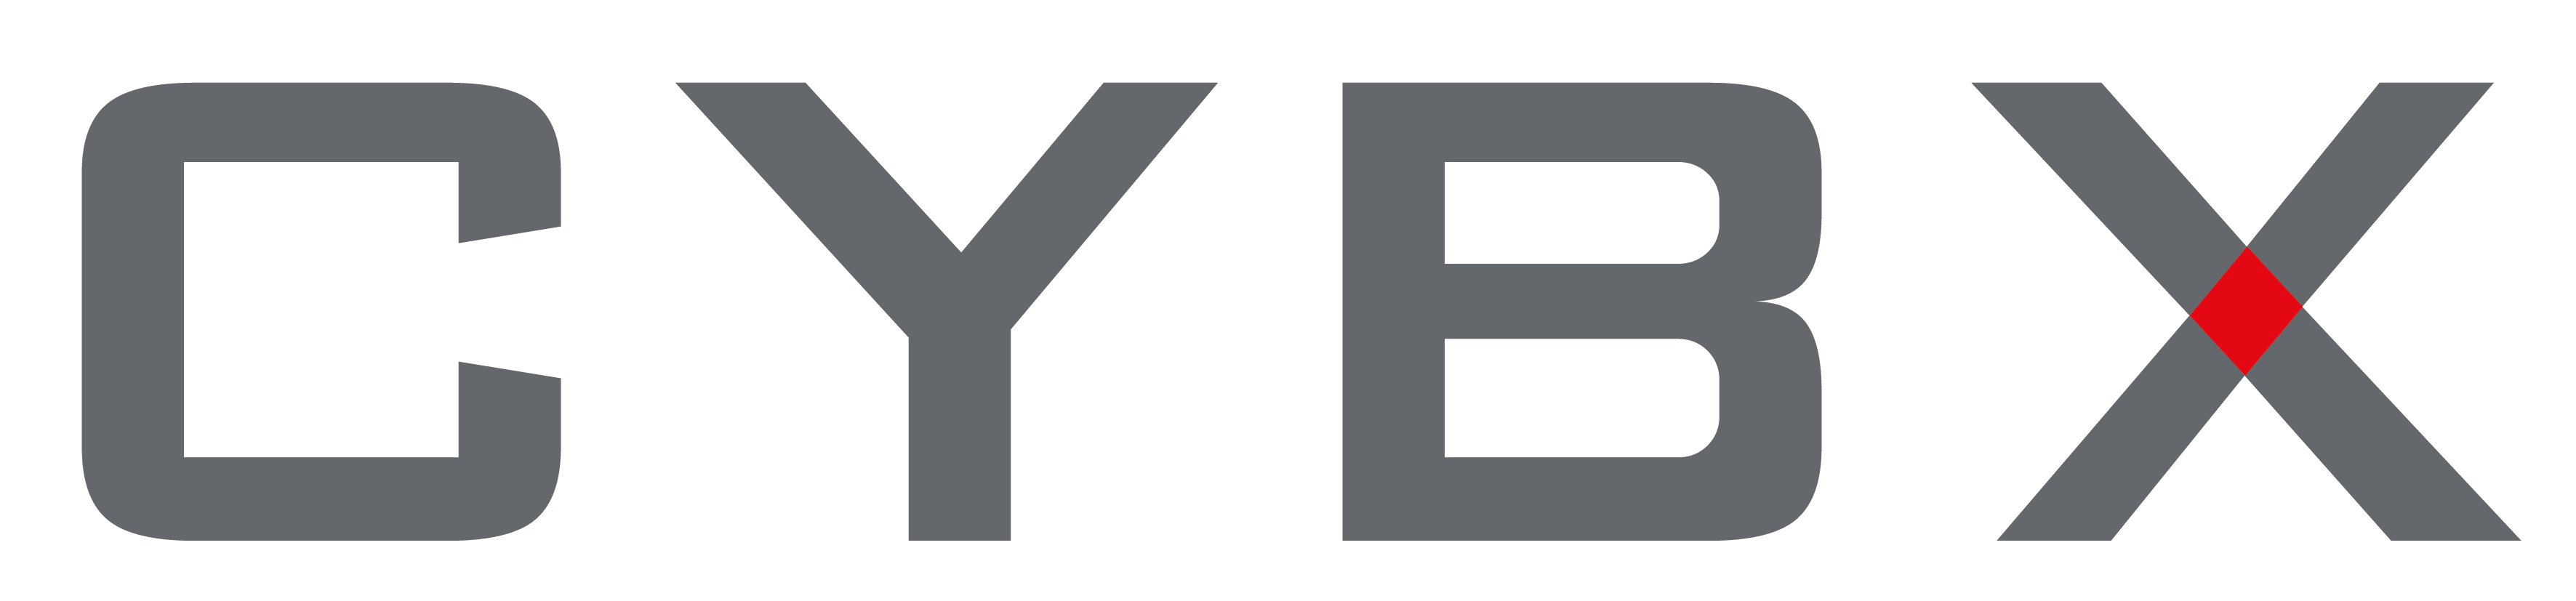 Cybx Logo